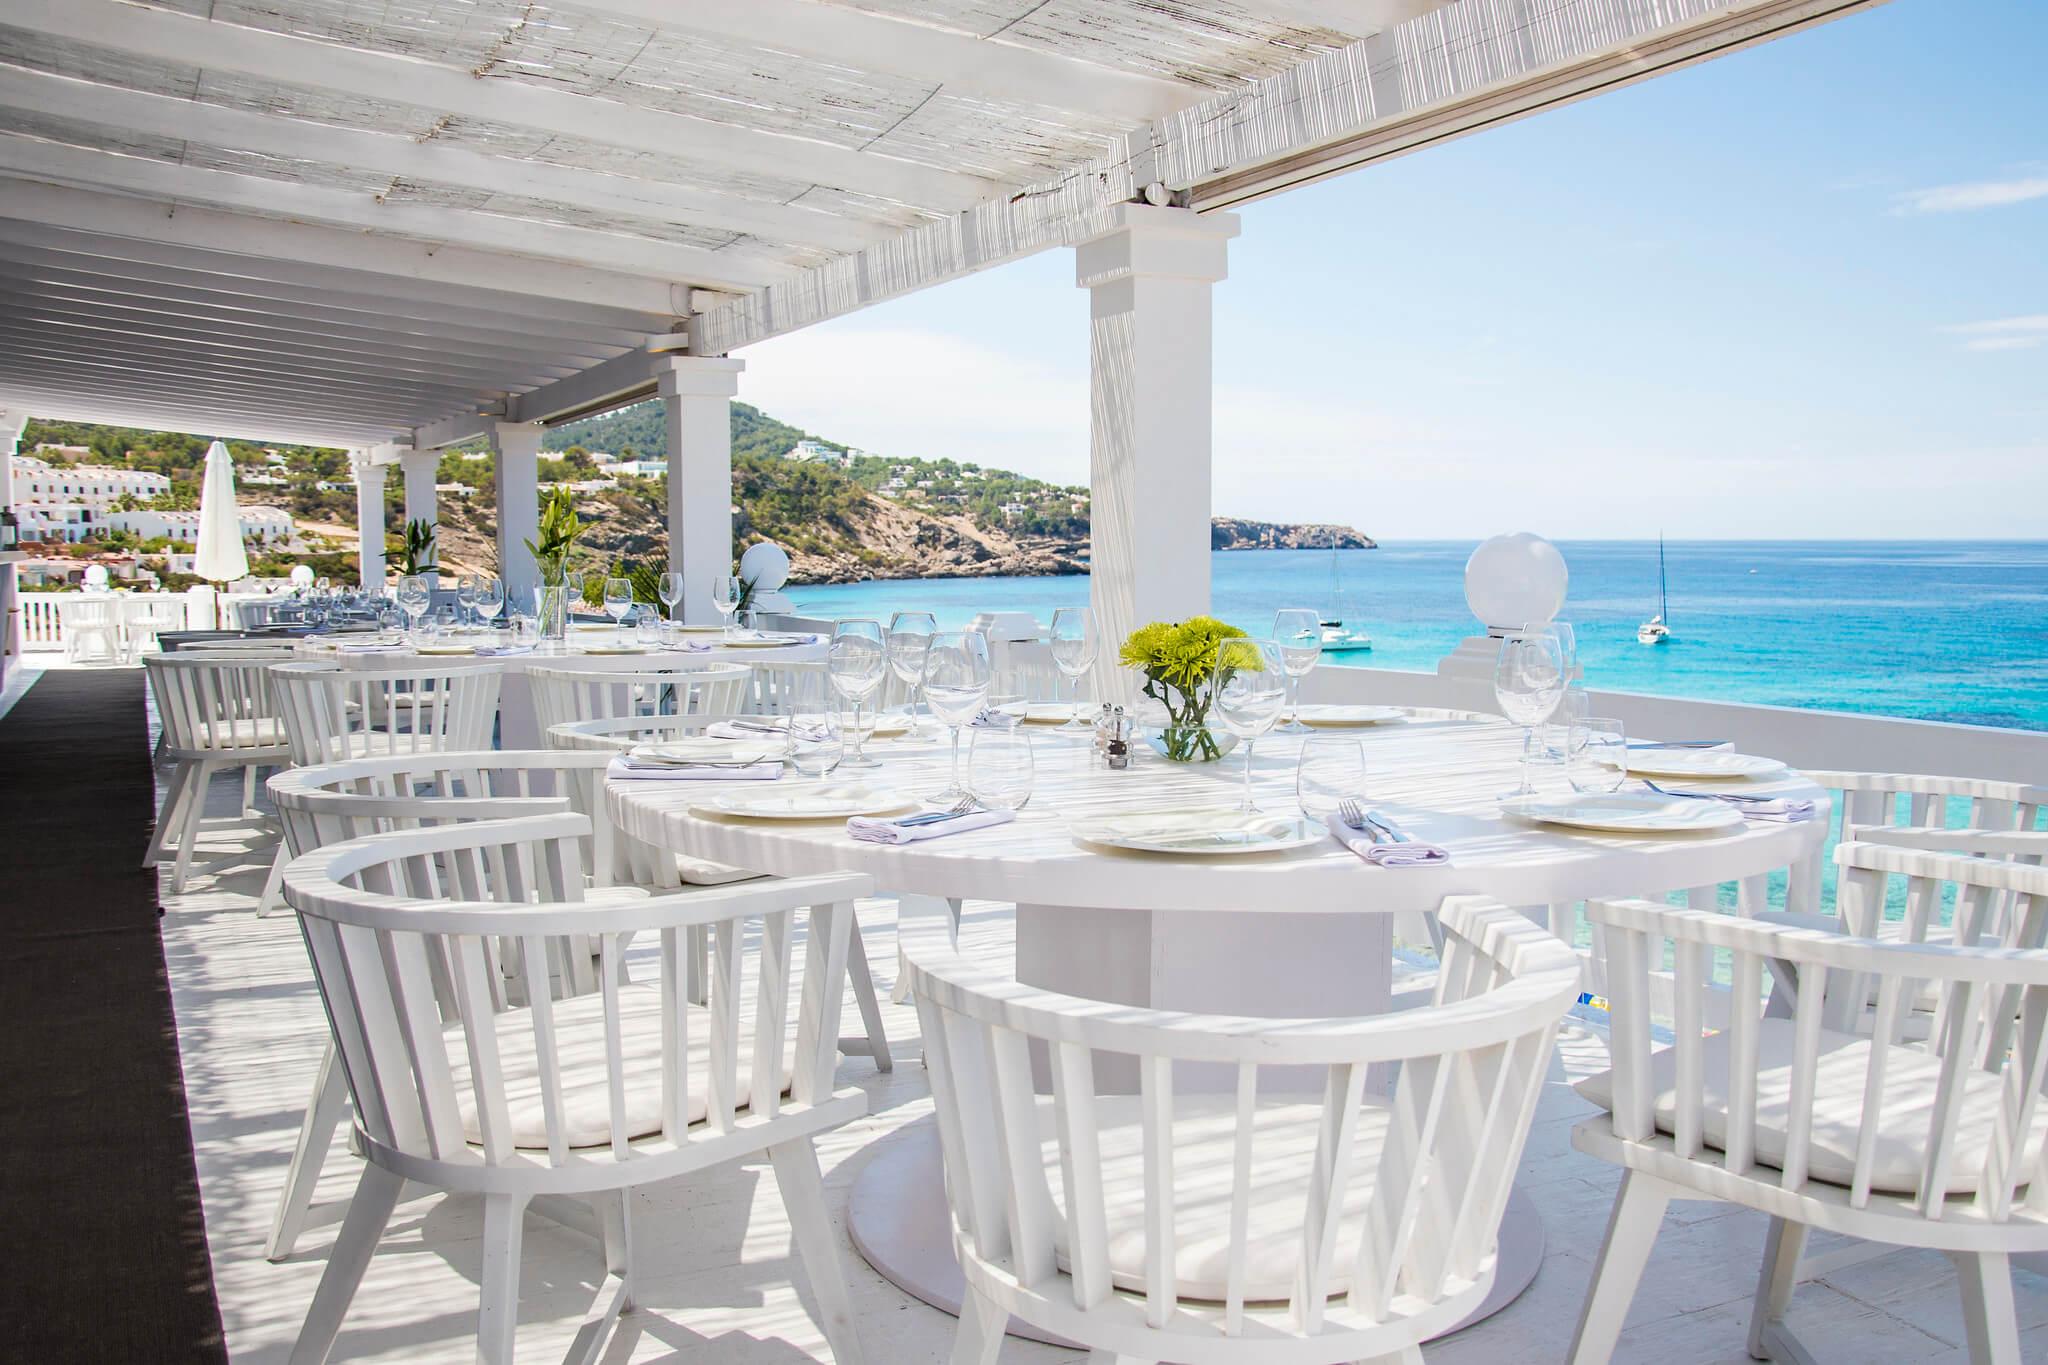 https://www.white-ibiza.com/wp-content/uploads/2020/03/ibiza-beach-restaurant-cotton-beach-club-2020-05.jpg